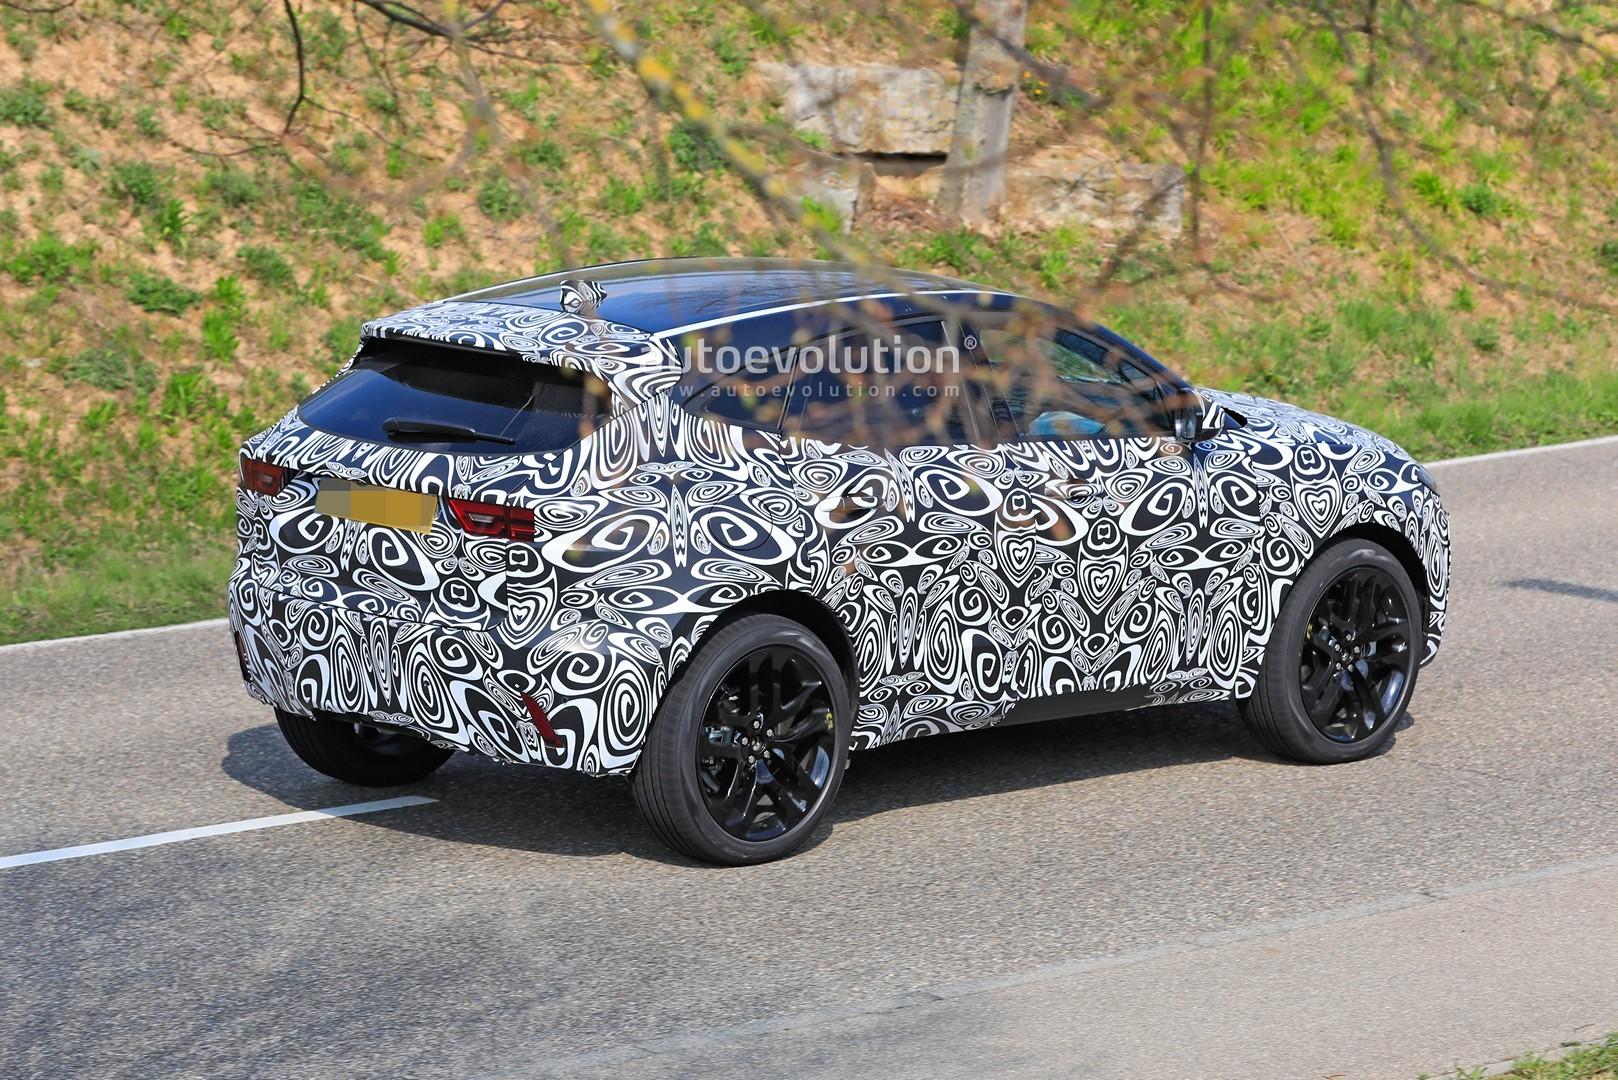 2021 jaguar epace spied could get new range rover evoque